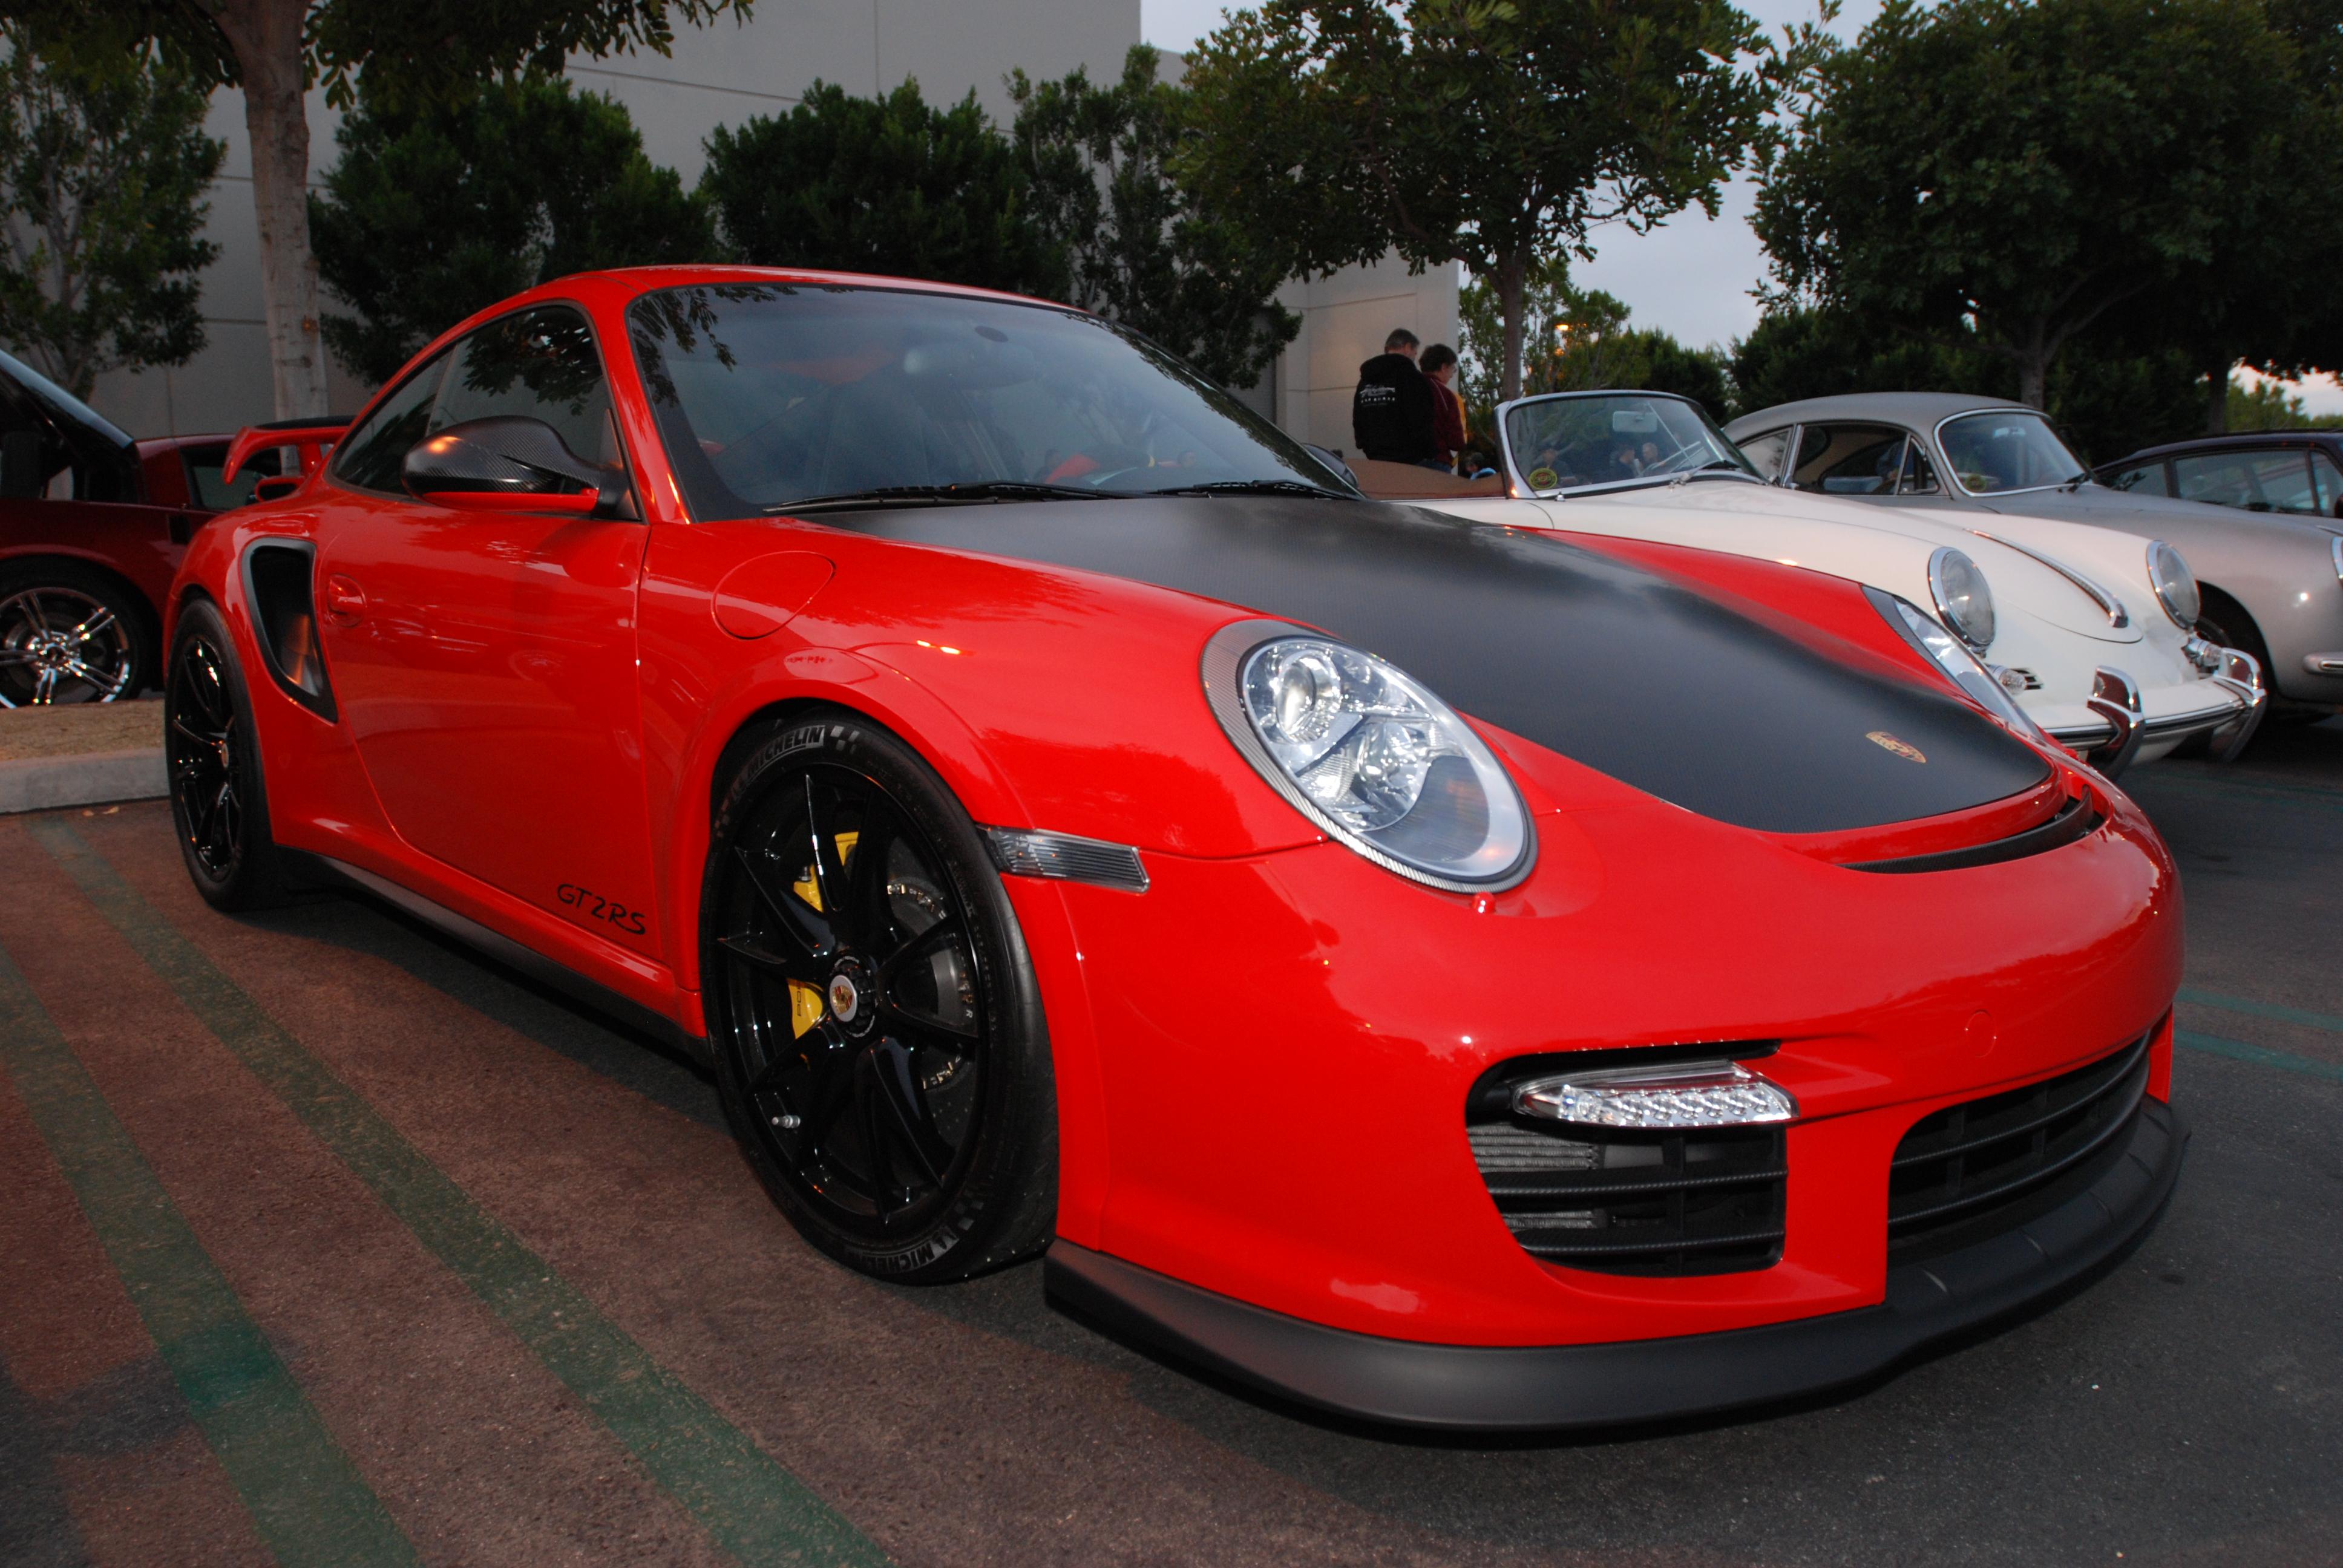 Red Porsche Car Red 2011 Porsche 911